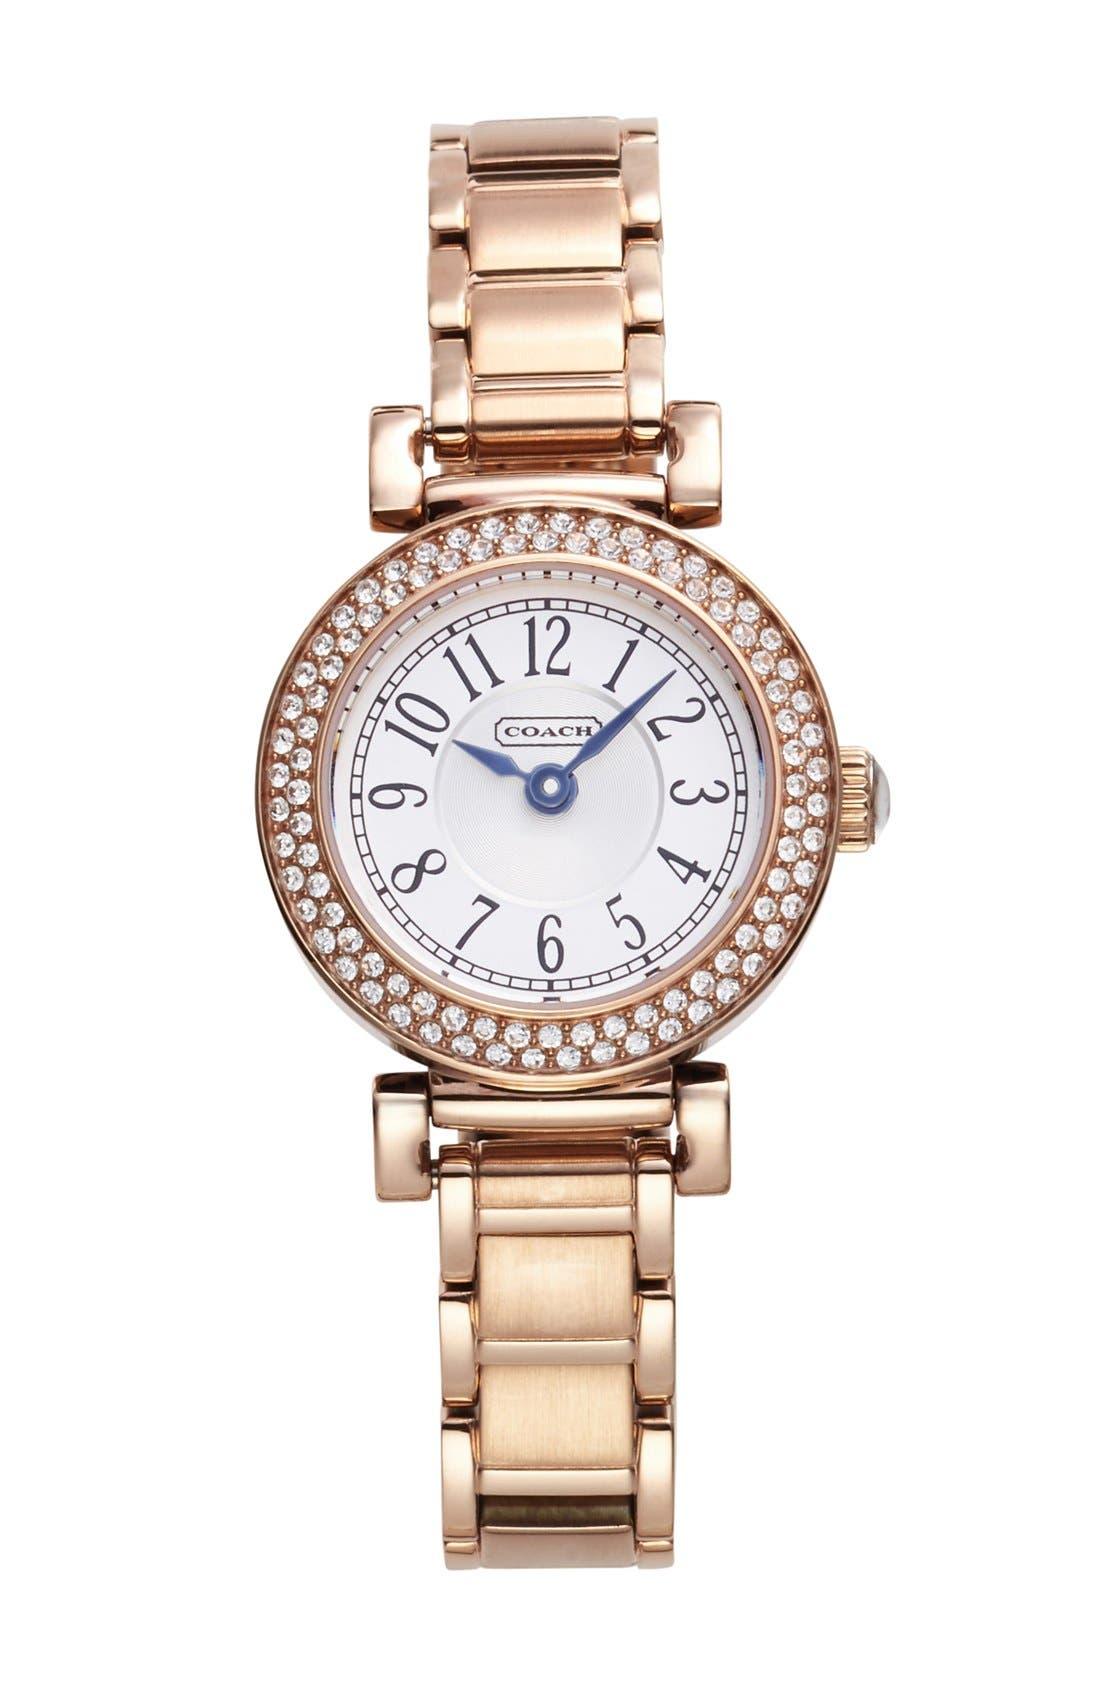 Main Image - COACH 'Madison' Crystal Bezel Bracelet Watch, 24mm